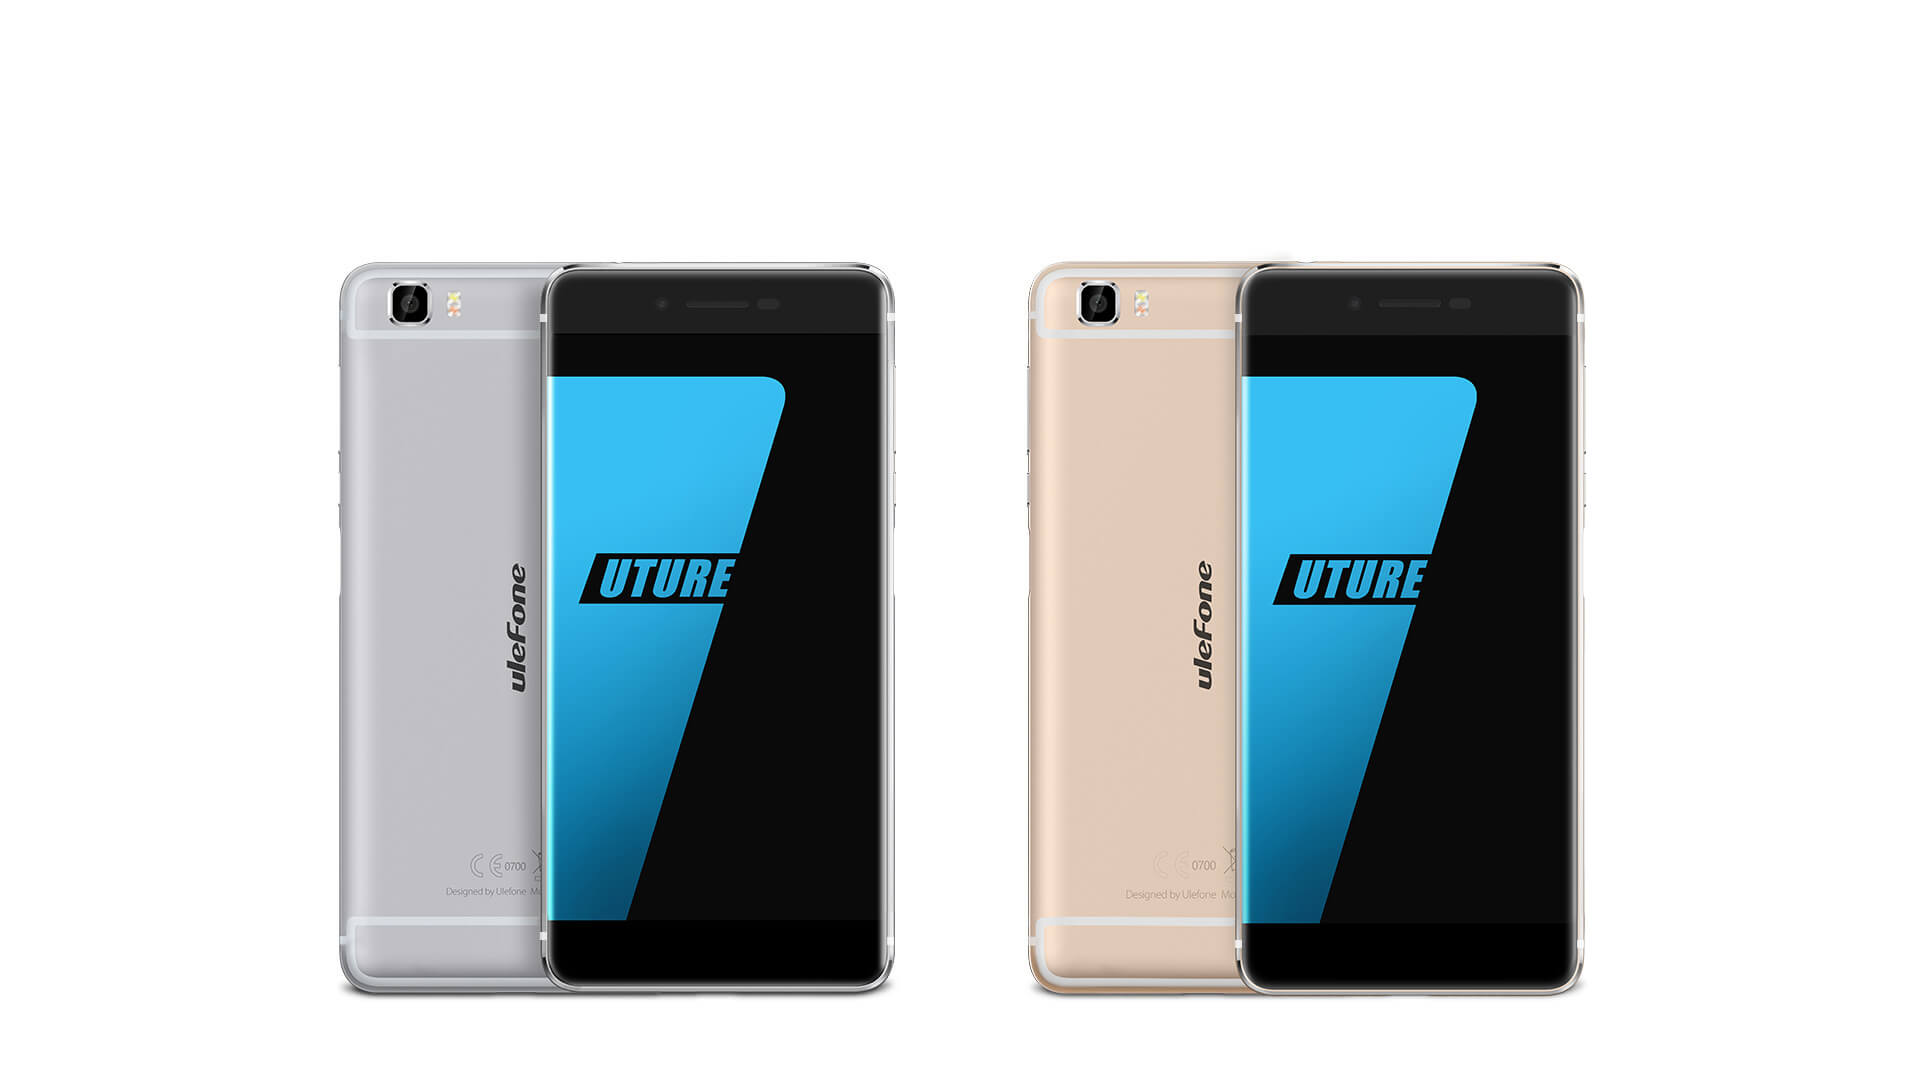 ulefone-future-colors